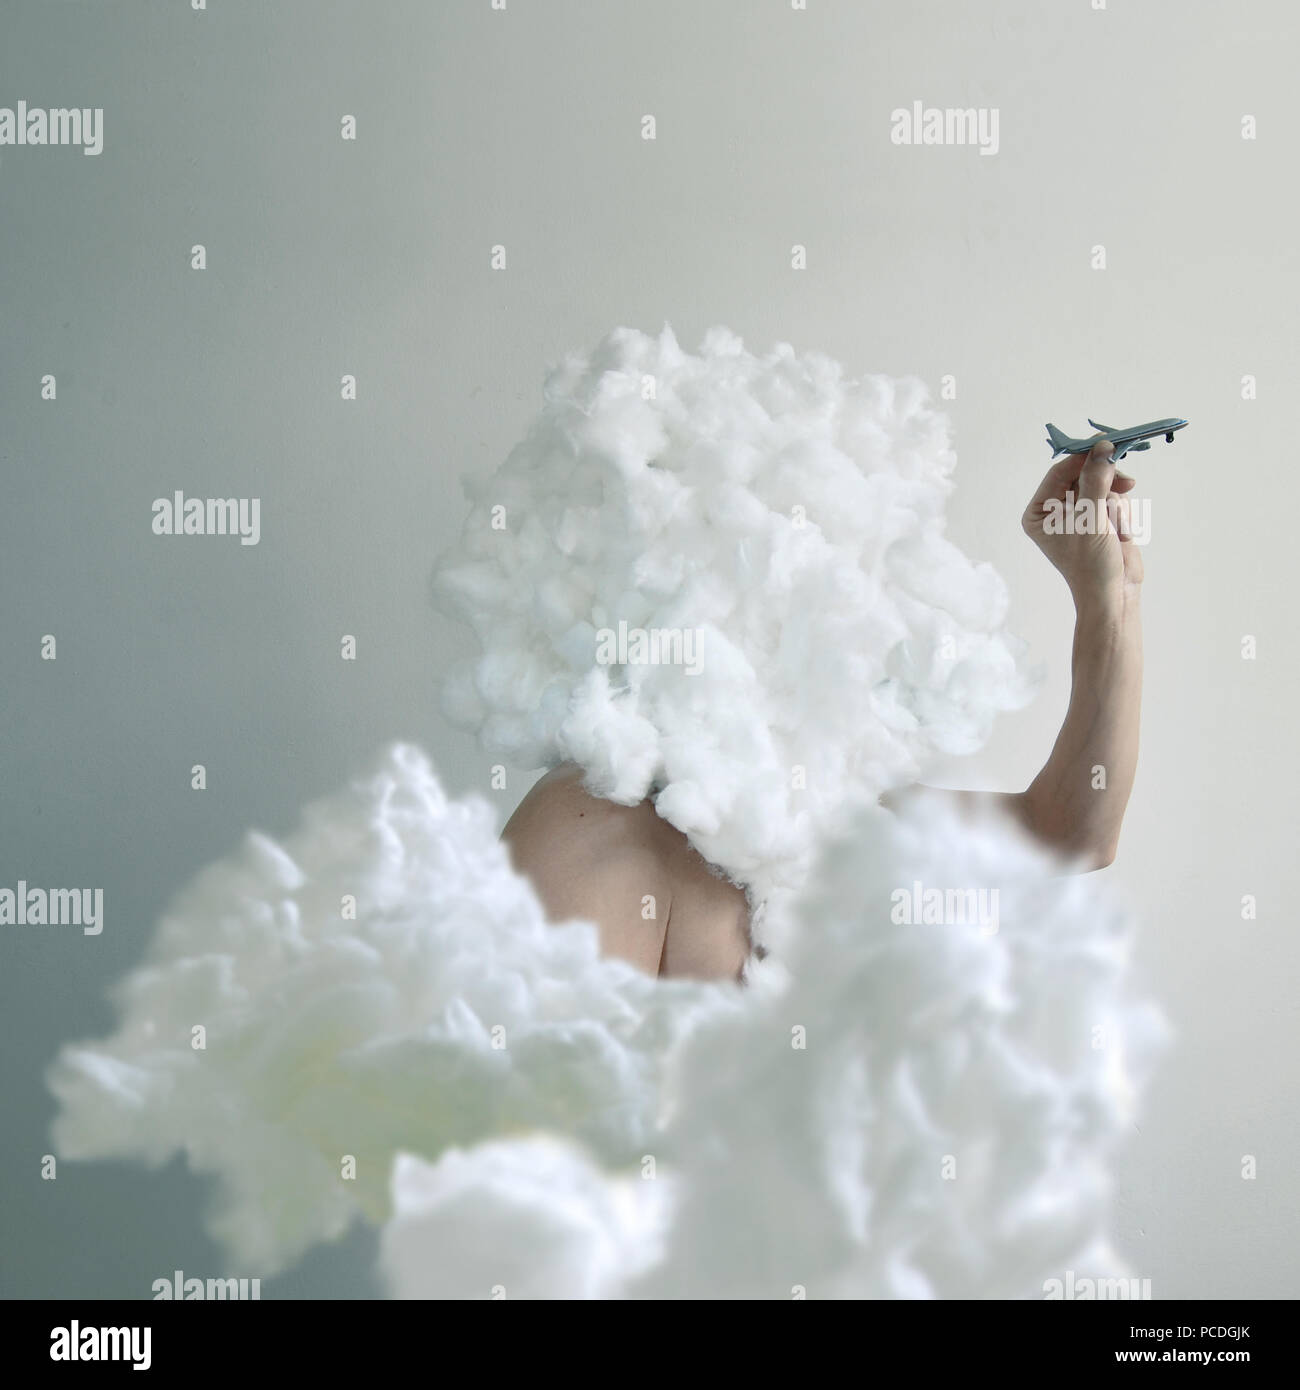 humor,bizarre,airplane,clouds - Stock Image